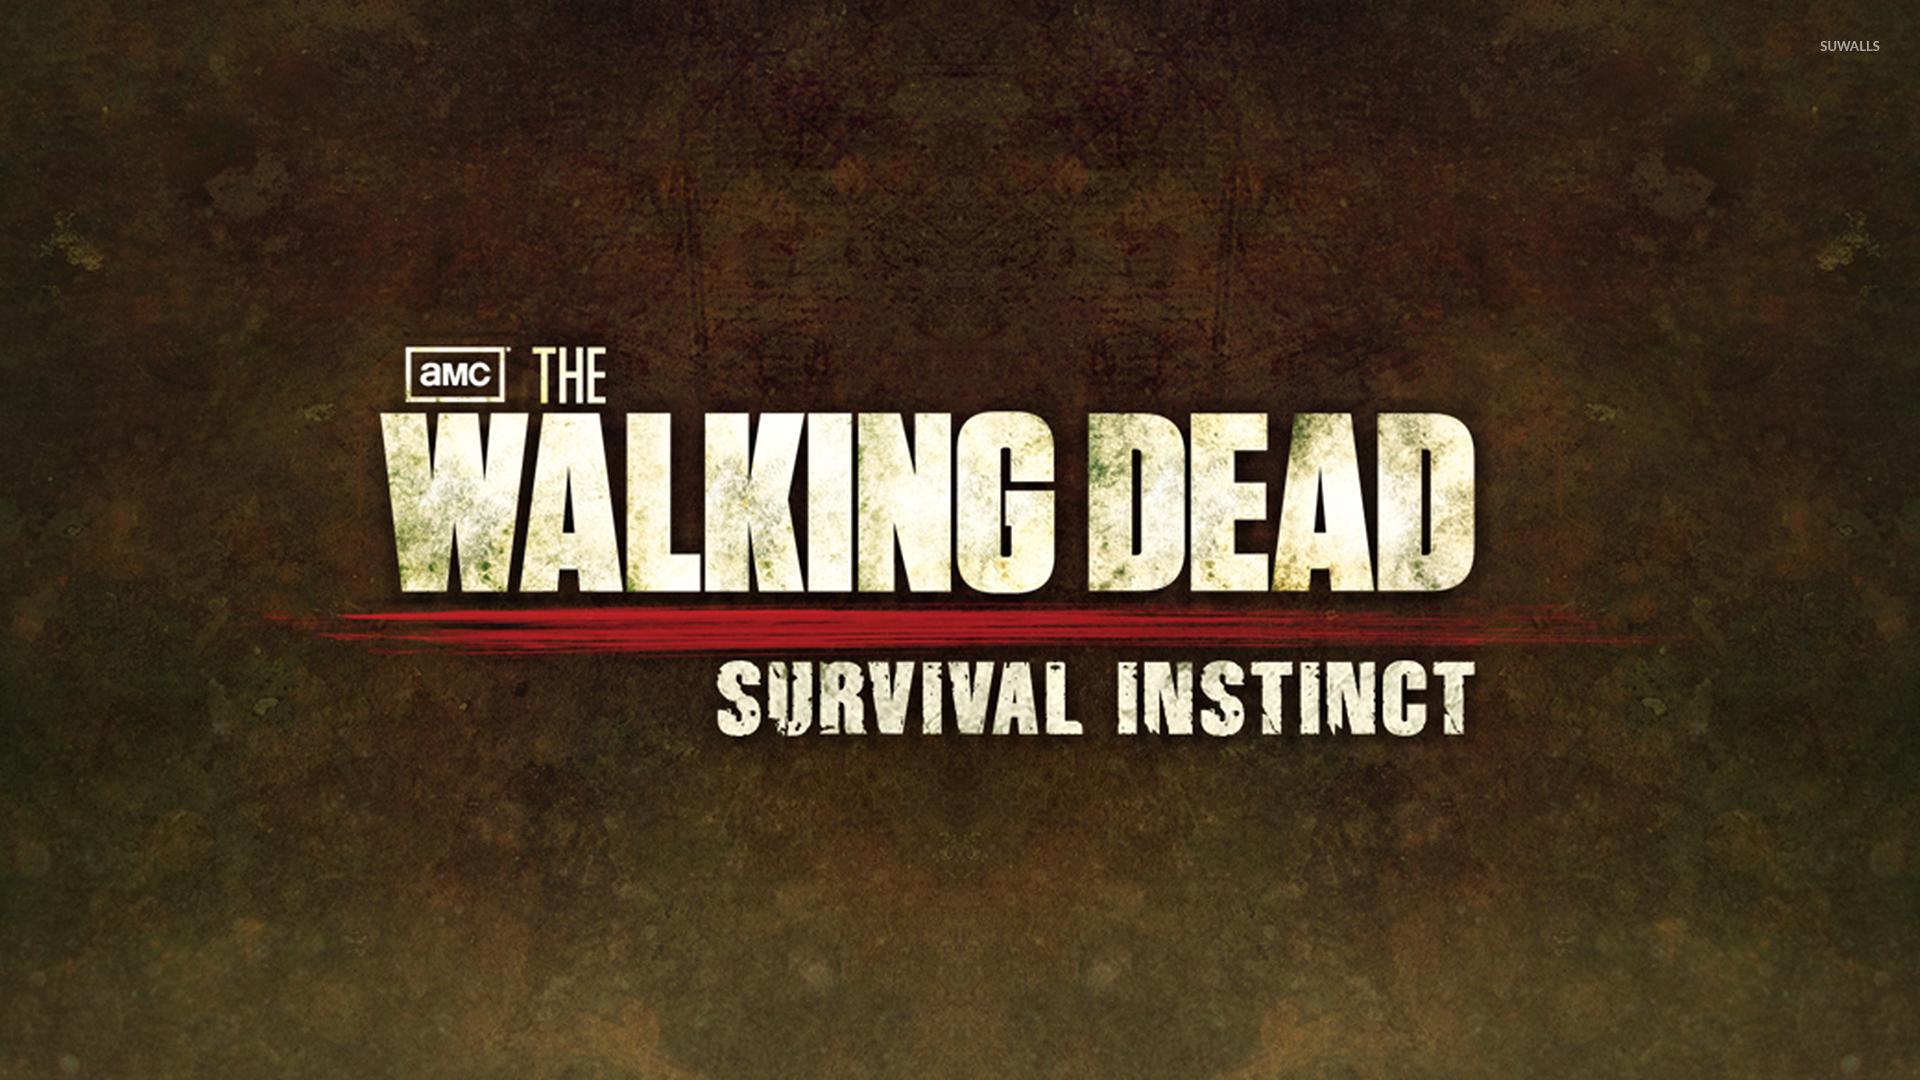 The Walking Dead Survival Instinct Wallpaper  TV Show